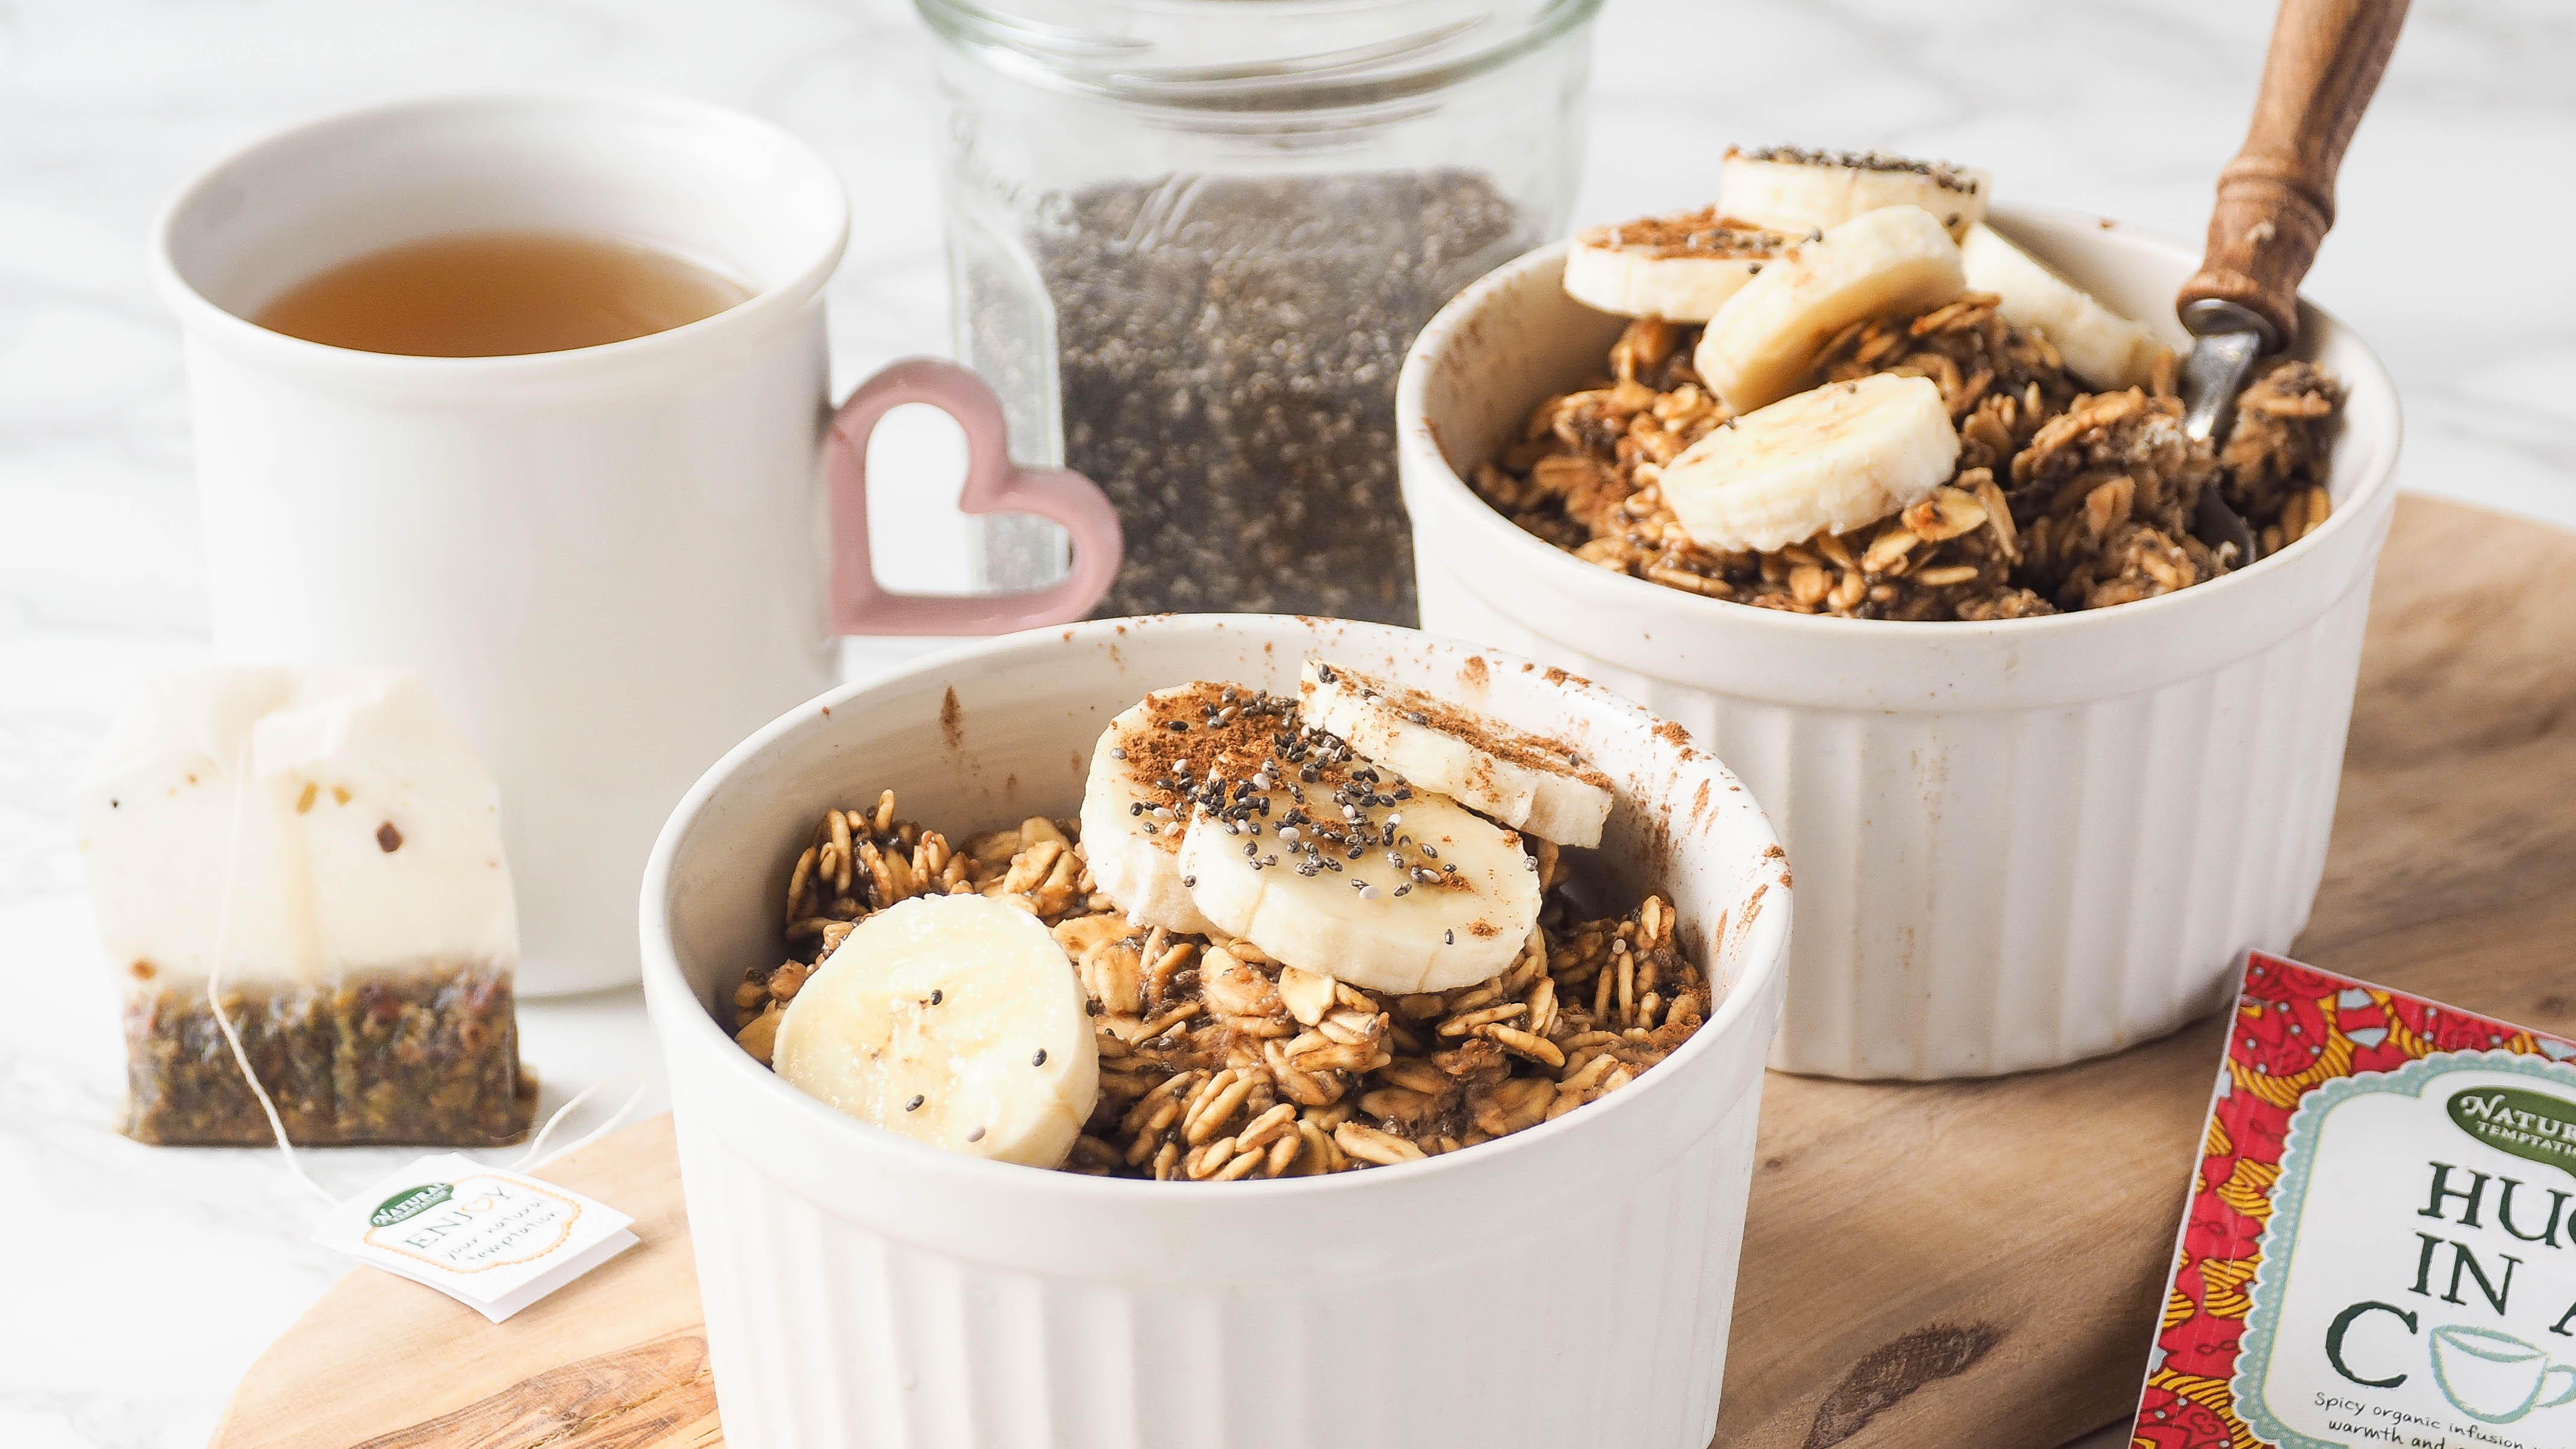 Recept: Baked oats met kruidige thee